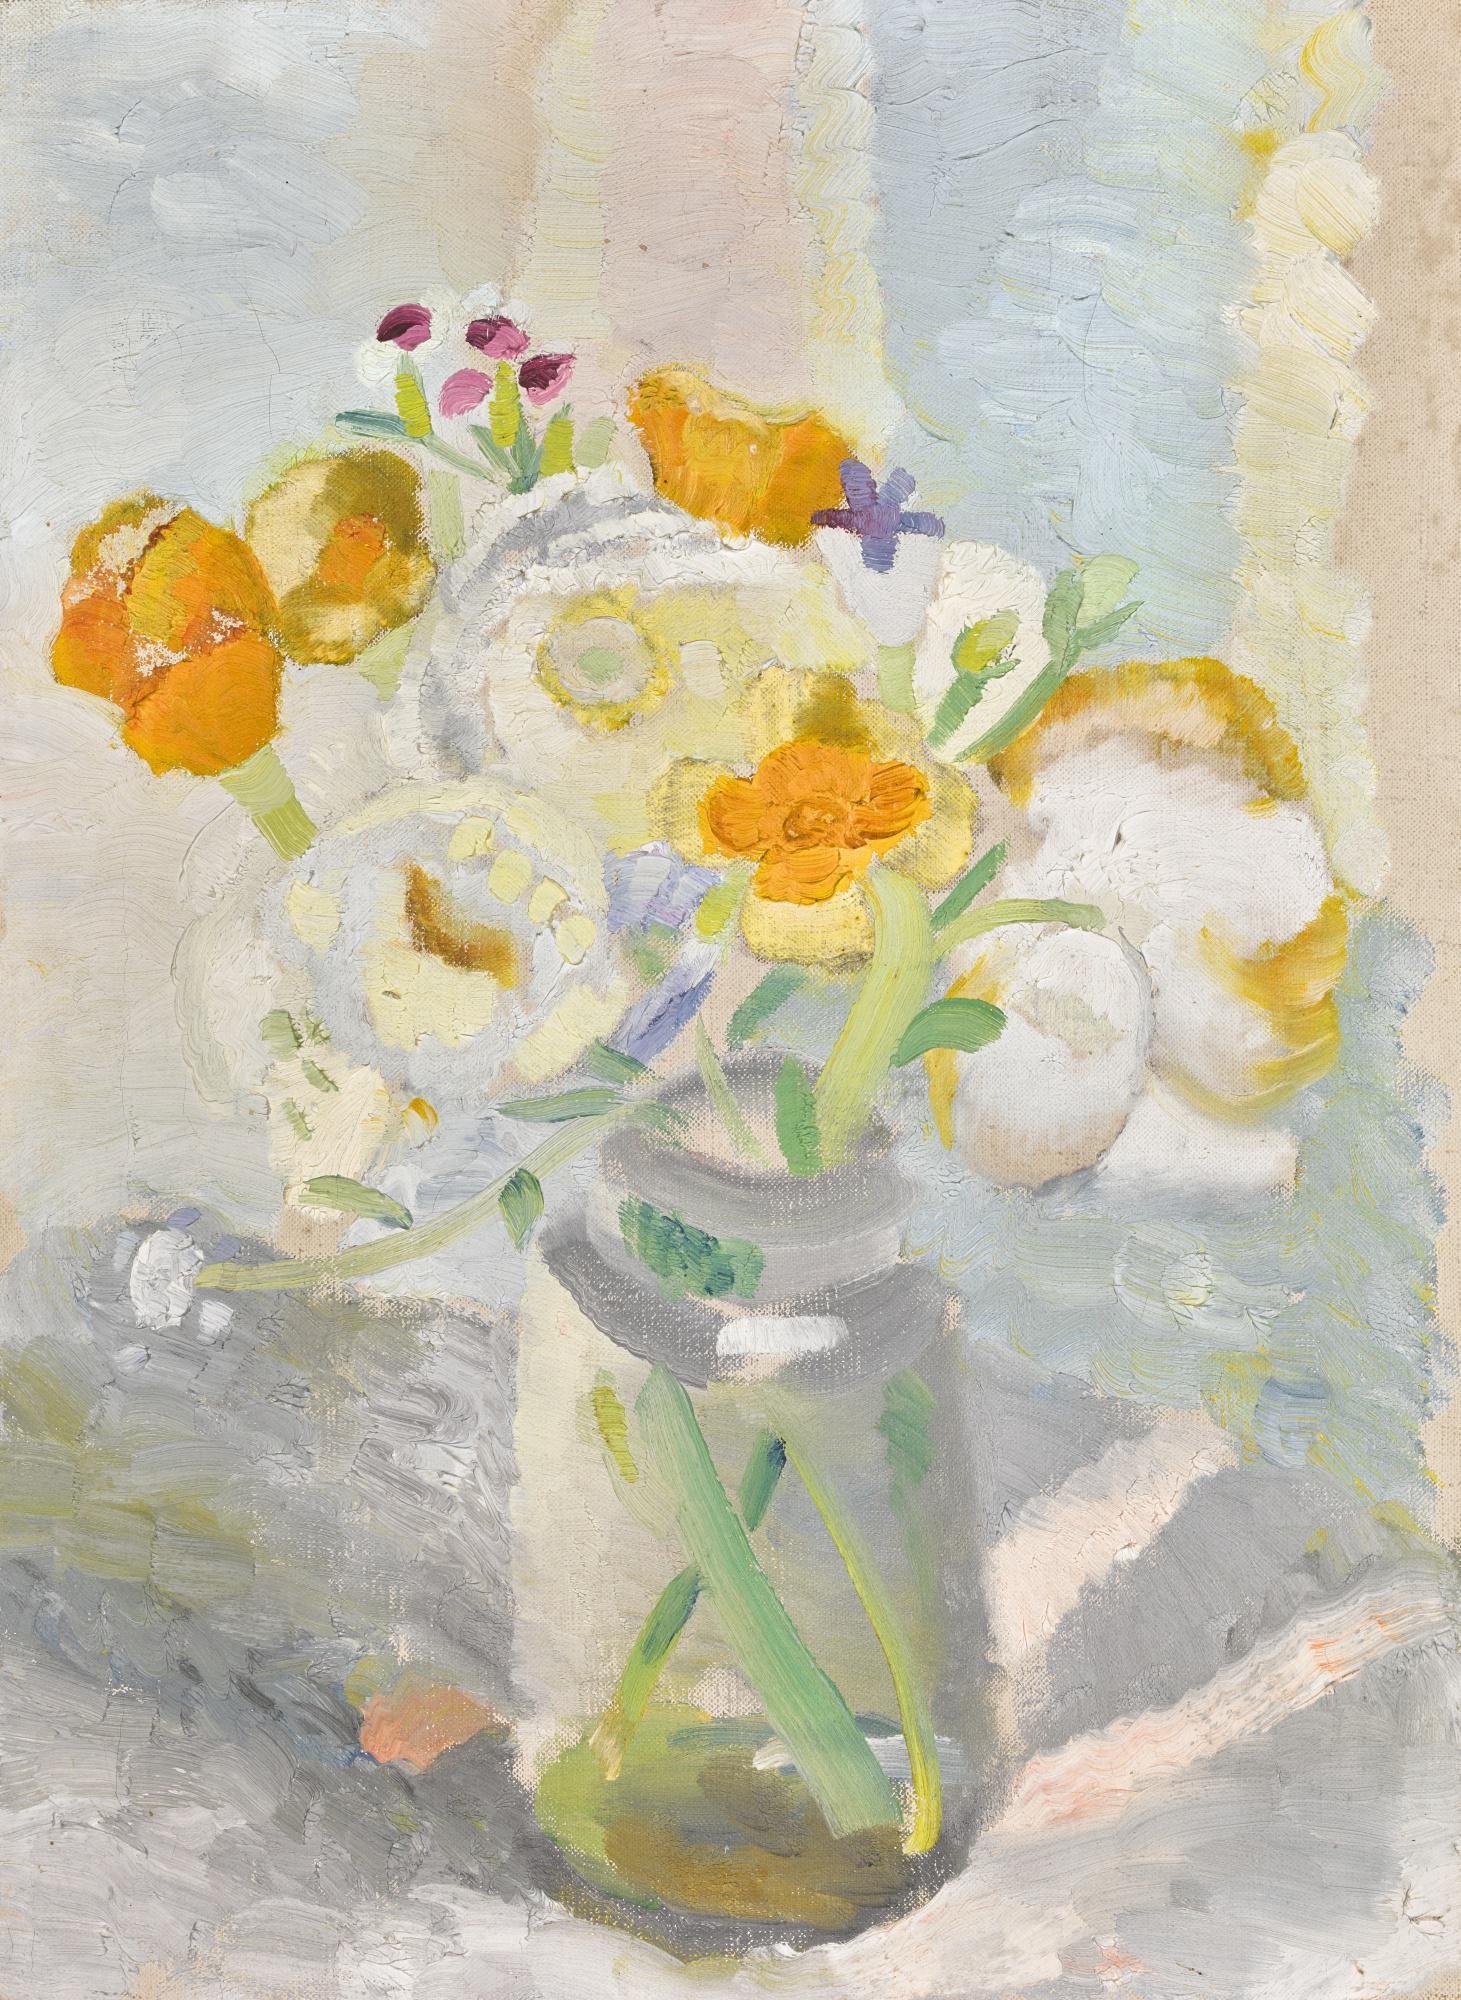 WINIFRED NICHOLSON   FLOWERS IN A JAM JAR